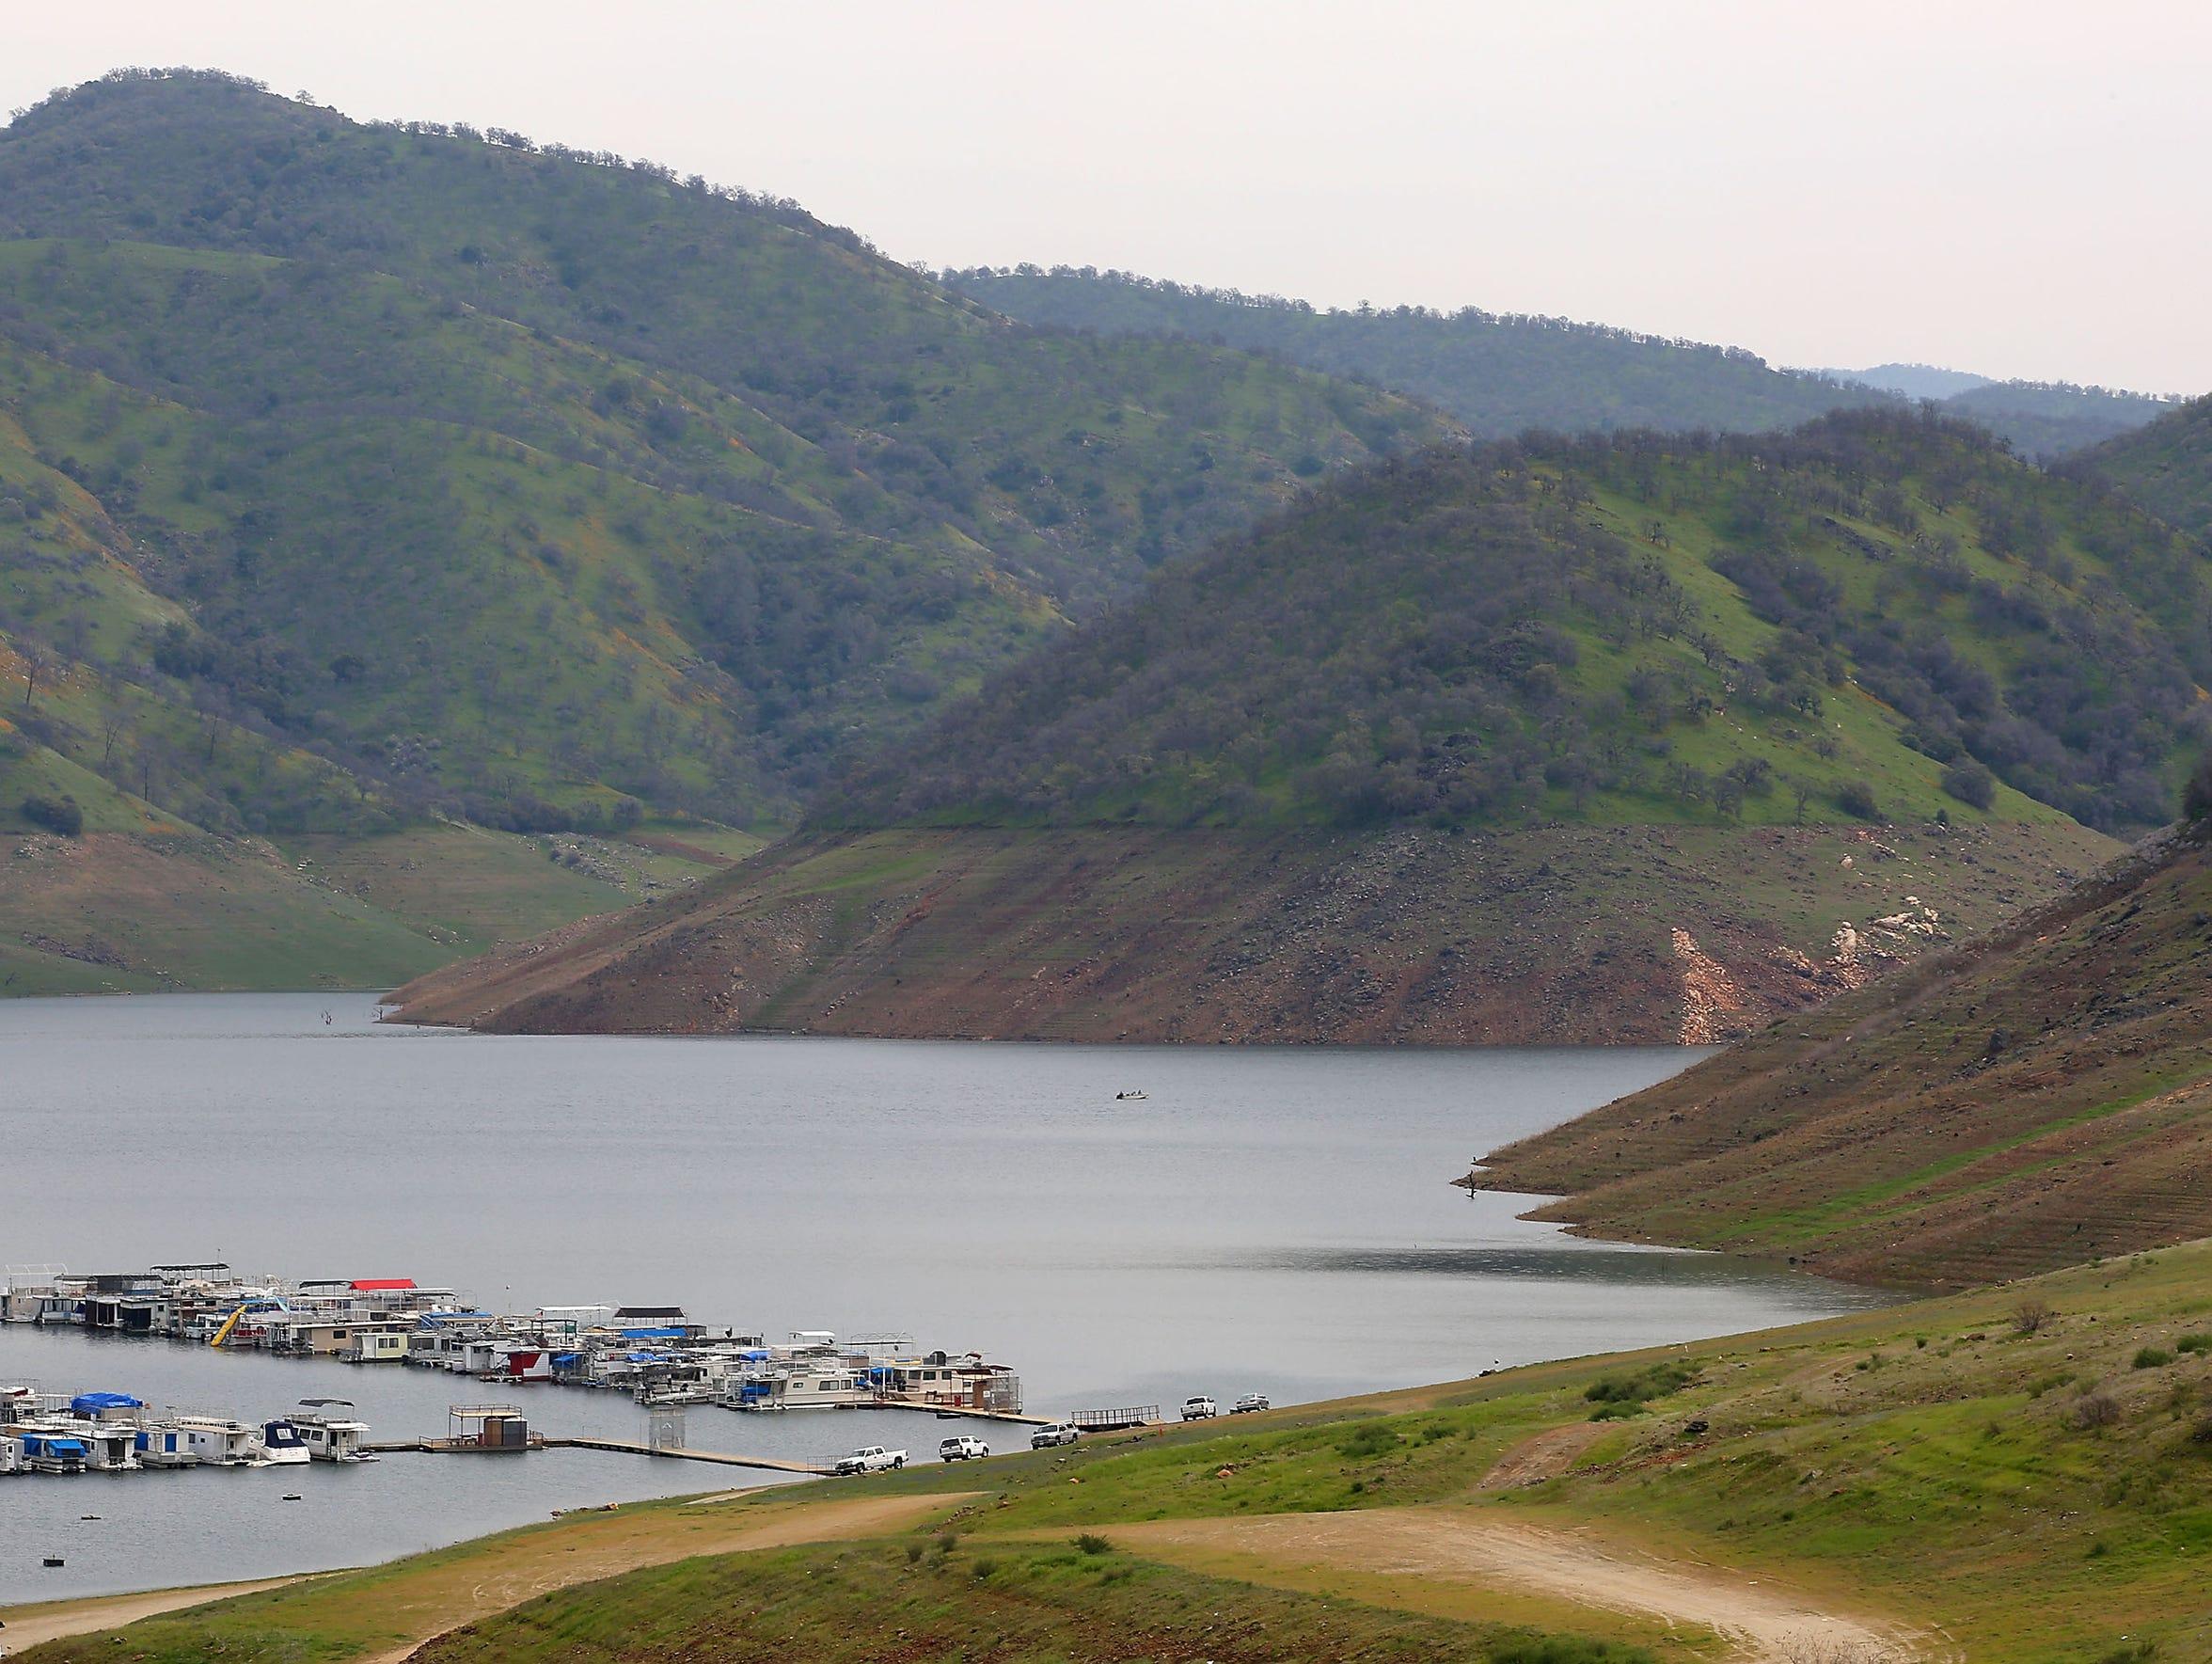 The levels of Pine Flat Reservoir near Fresno were